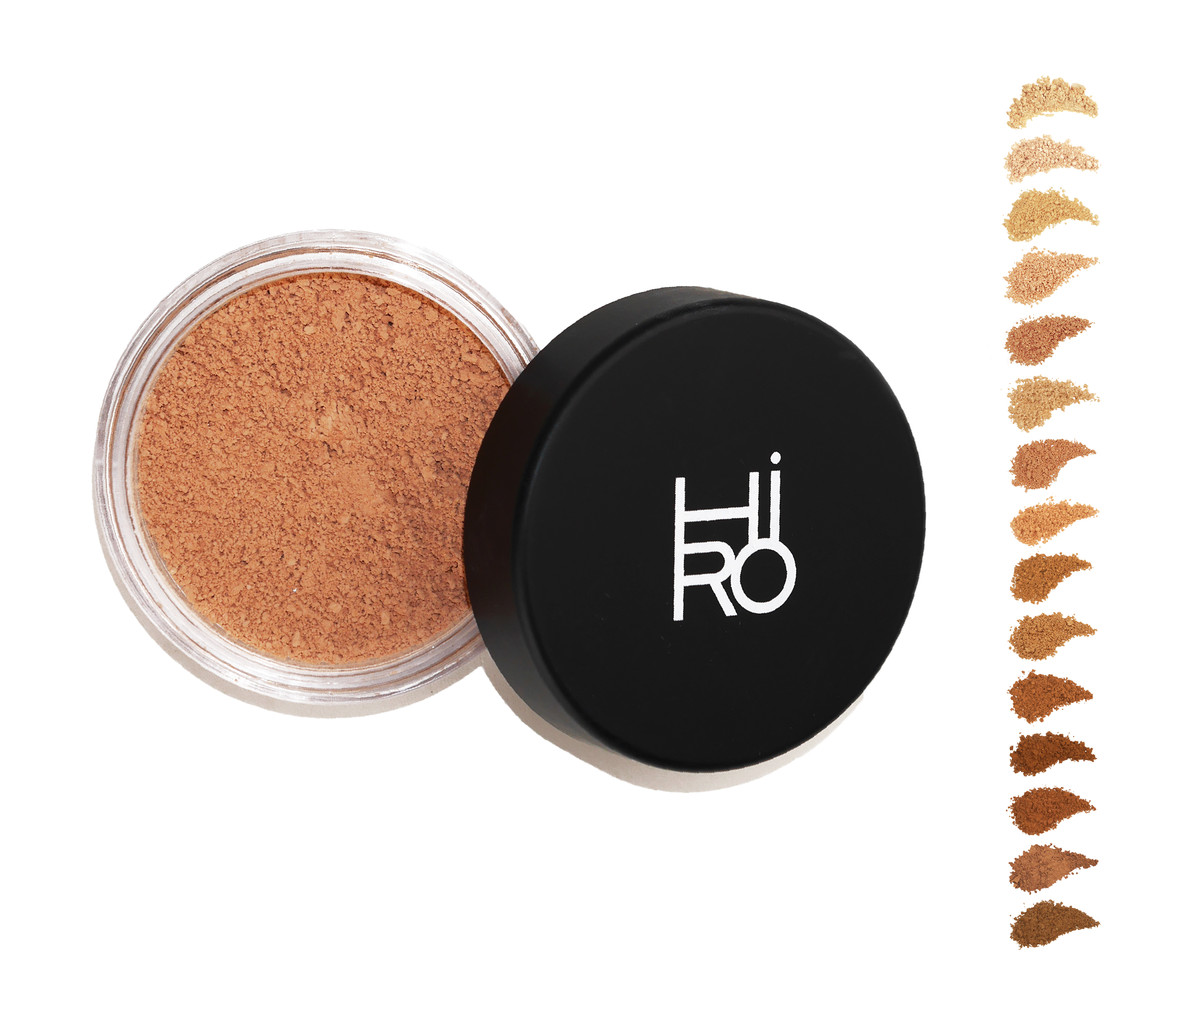 Hiro Cosmetics Mineral Foundation Mit Lsf